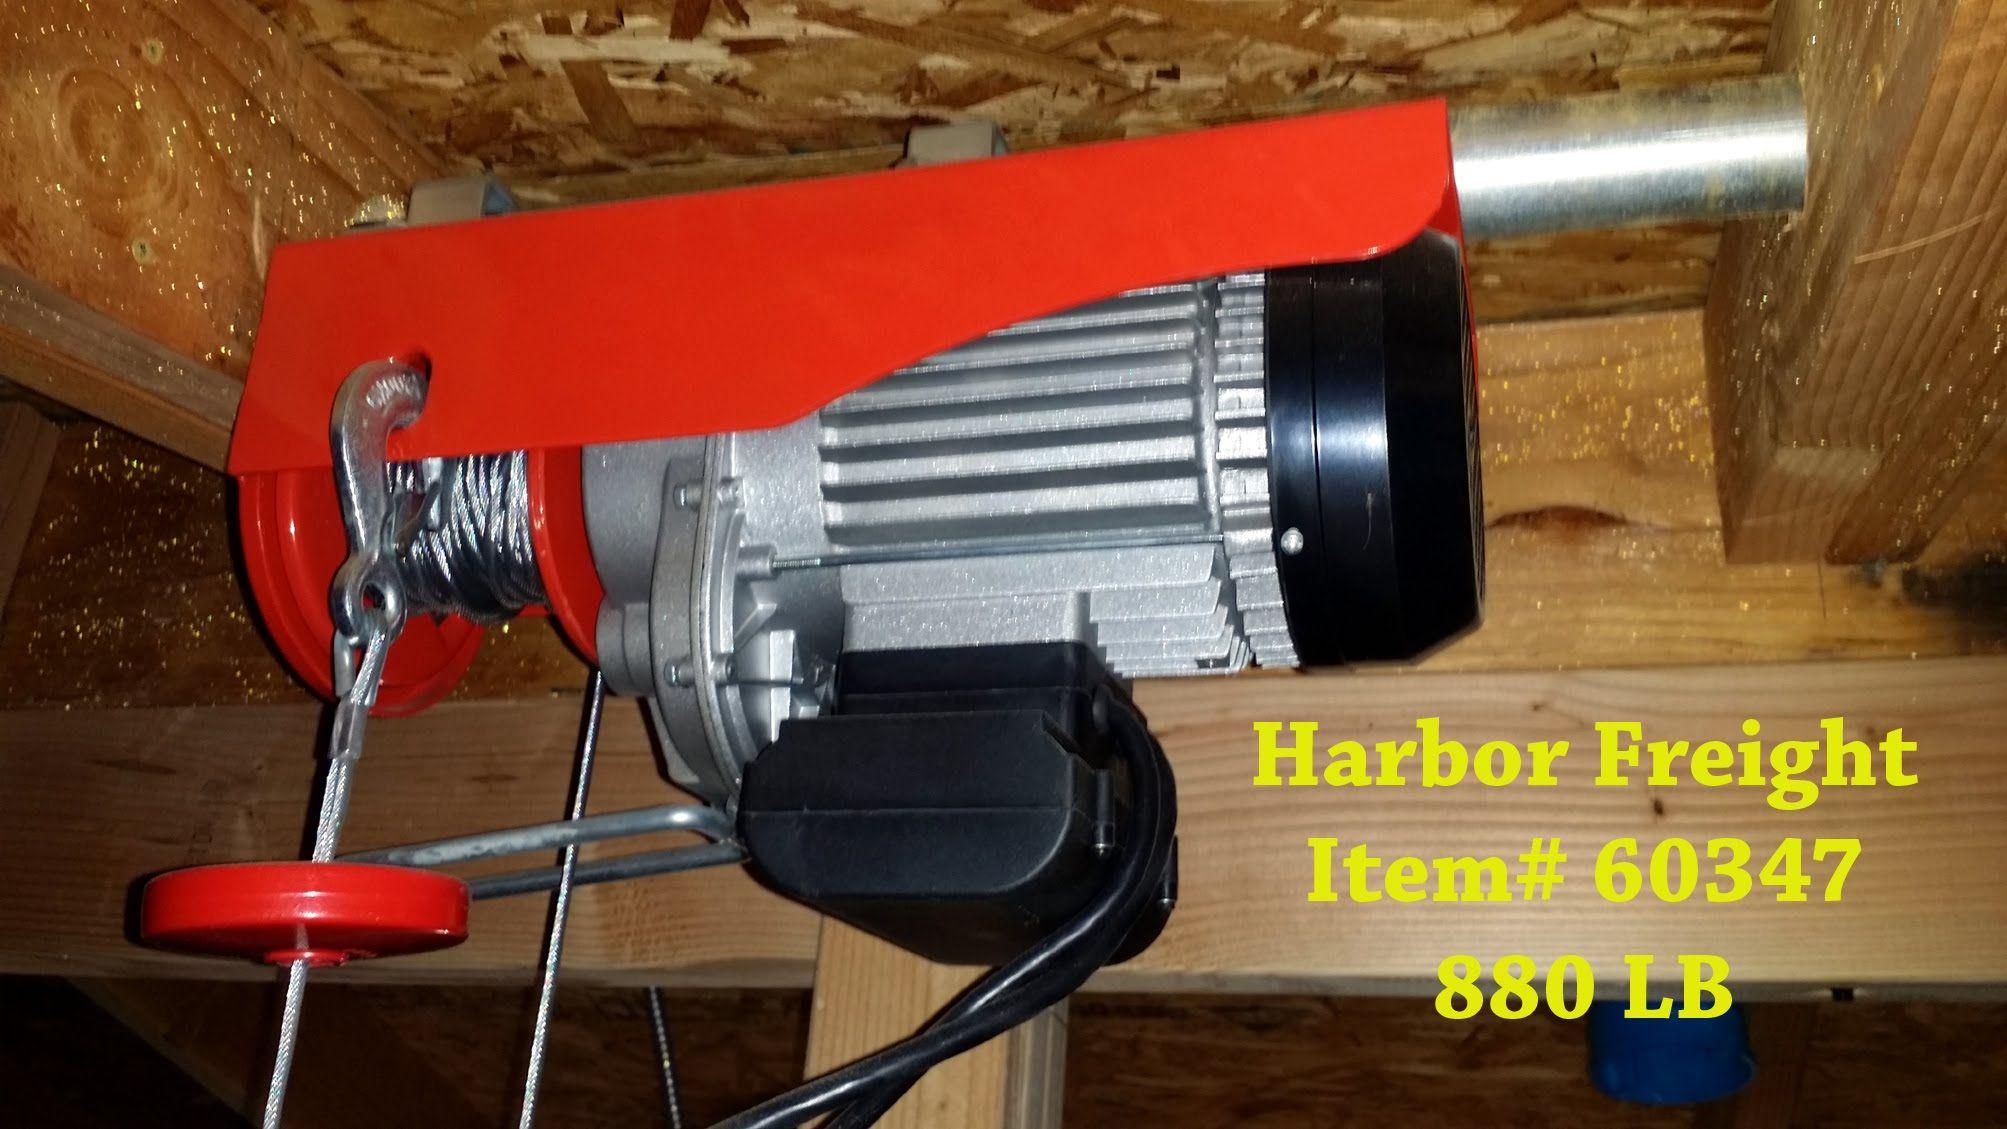 Harbor Freight 60347 880 LB winch | CARPENTRY TUTORIALS